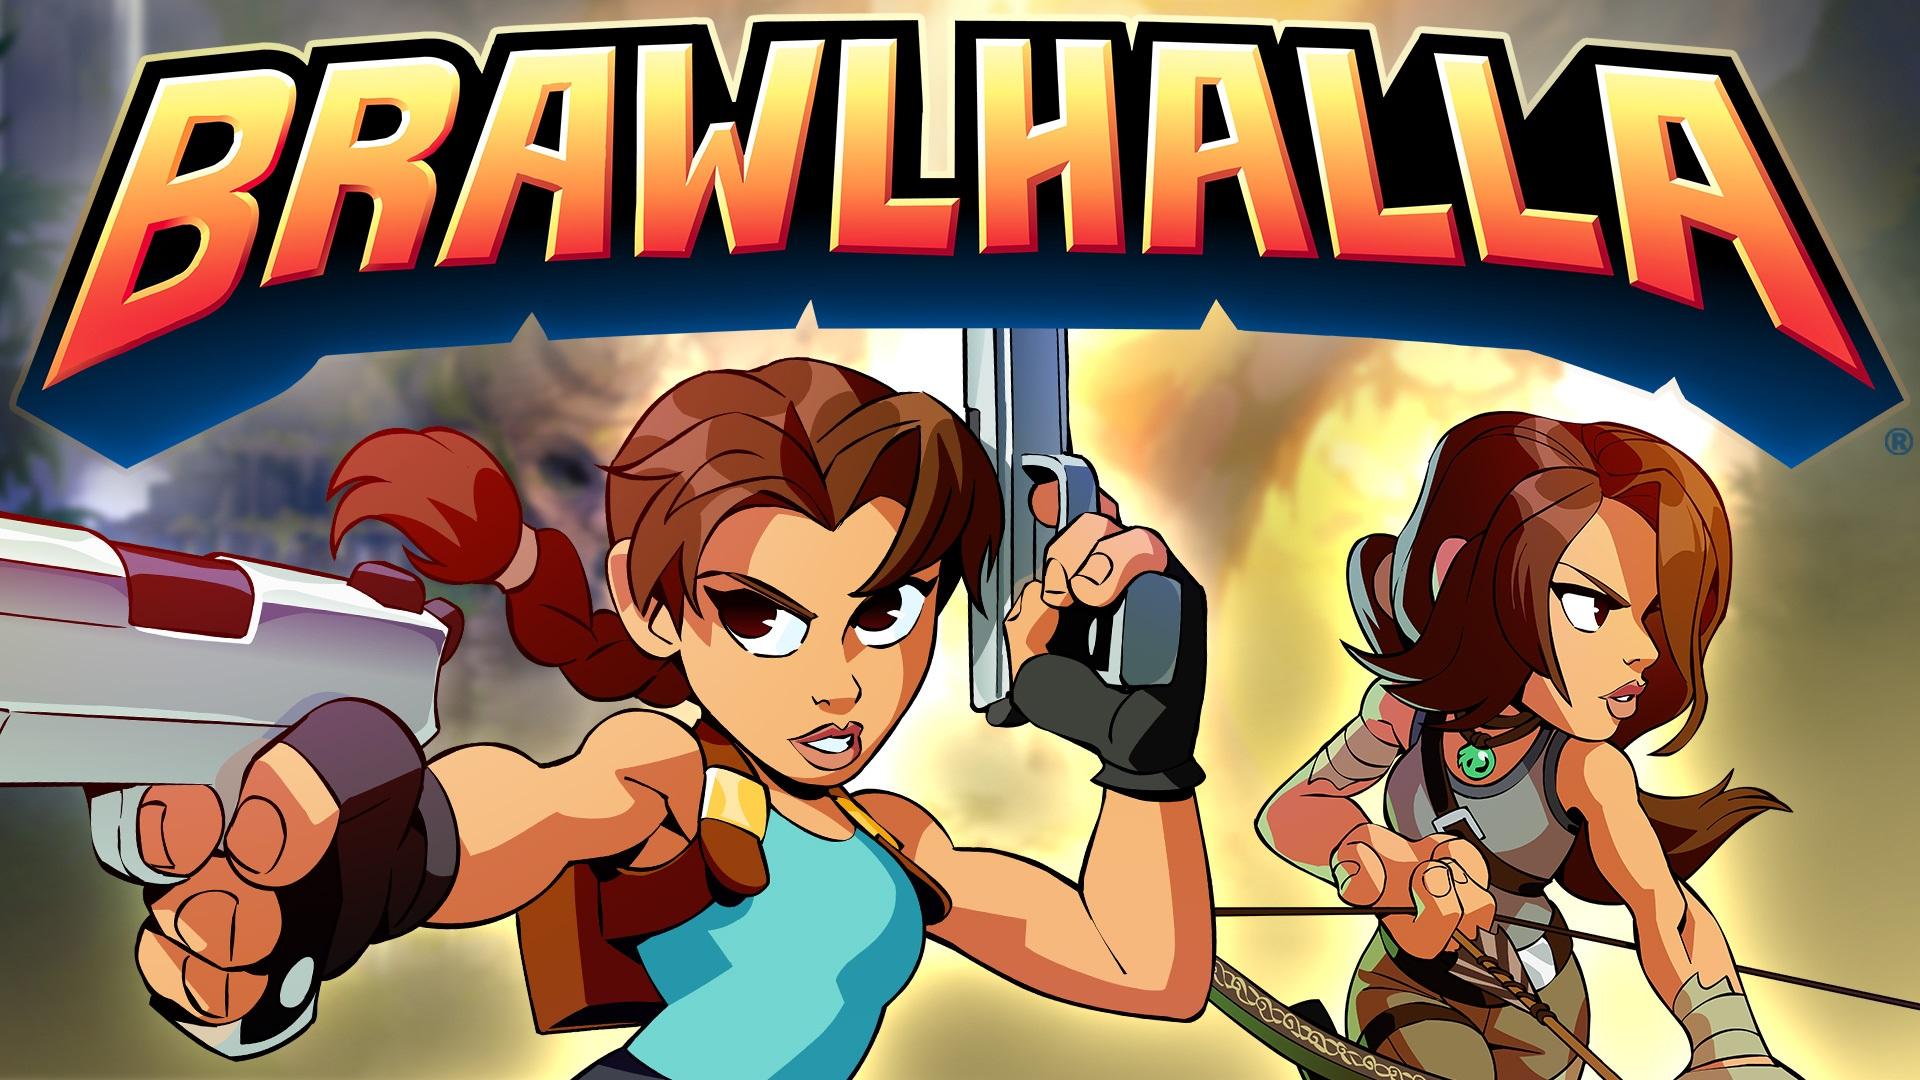 Brawlhalla Reveals Tomb Raider Crossover Nintendo Everything